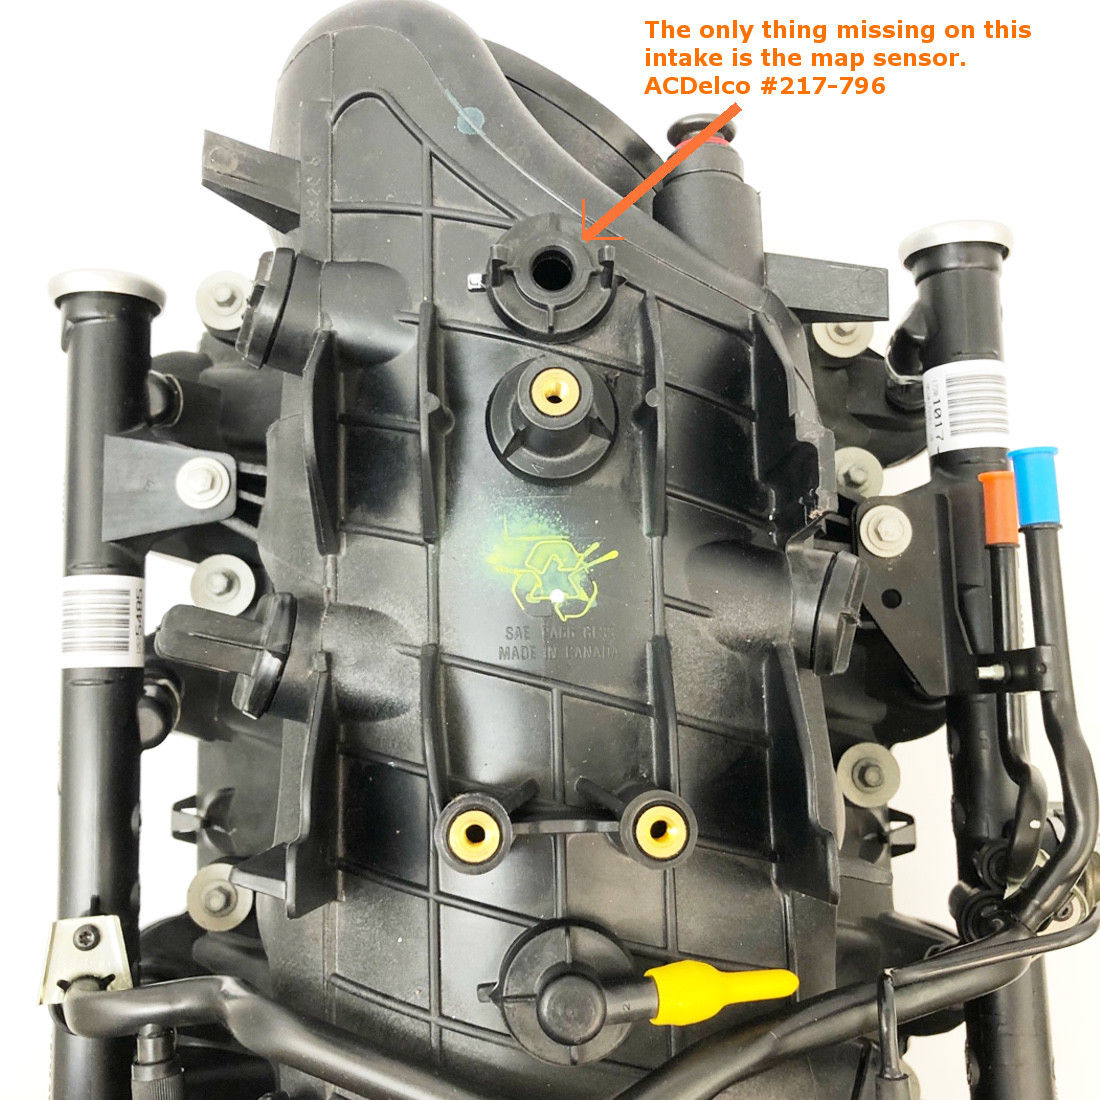 New Delphi / GM OEM Complete Intake (w/EGR) 2001-2002 4.8L ...